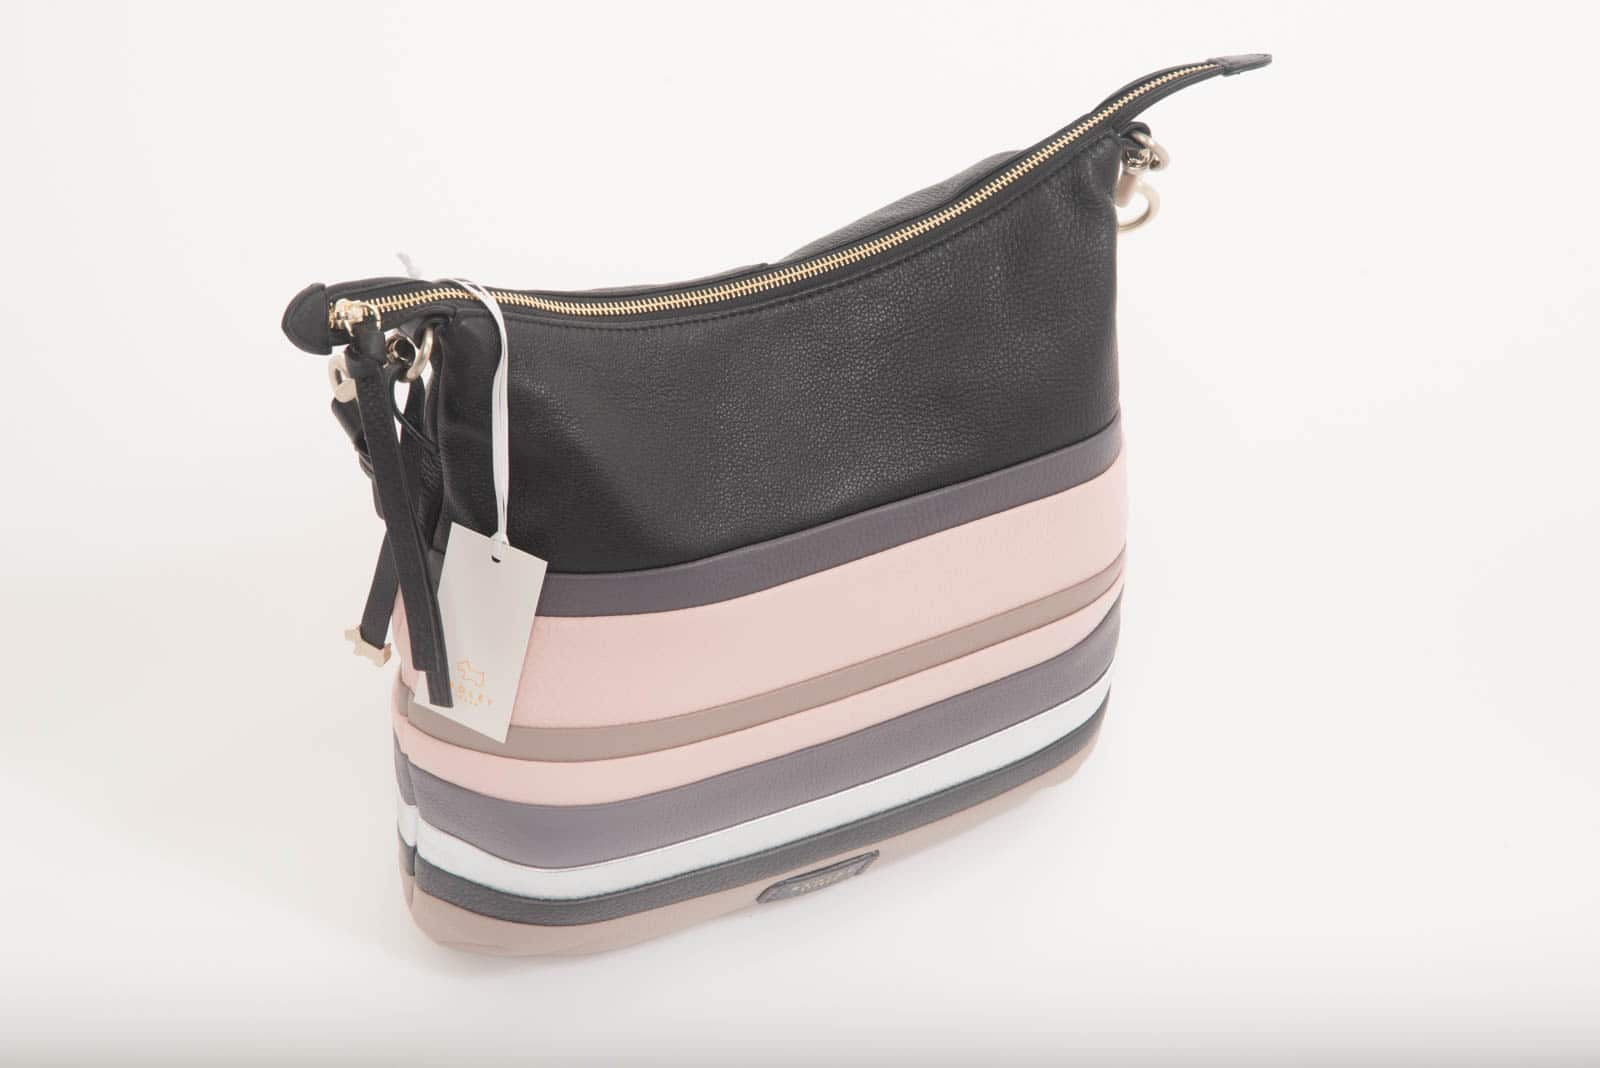 Radley Stripe Leather Feather Court Hobo Bag - DressXChange a635eacbf6fc8